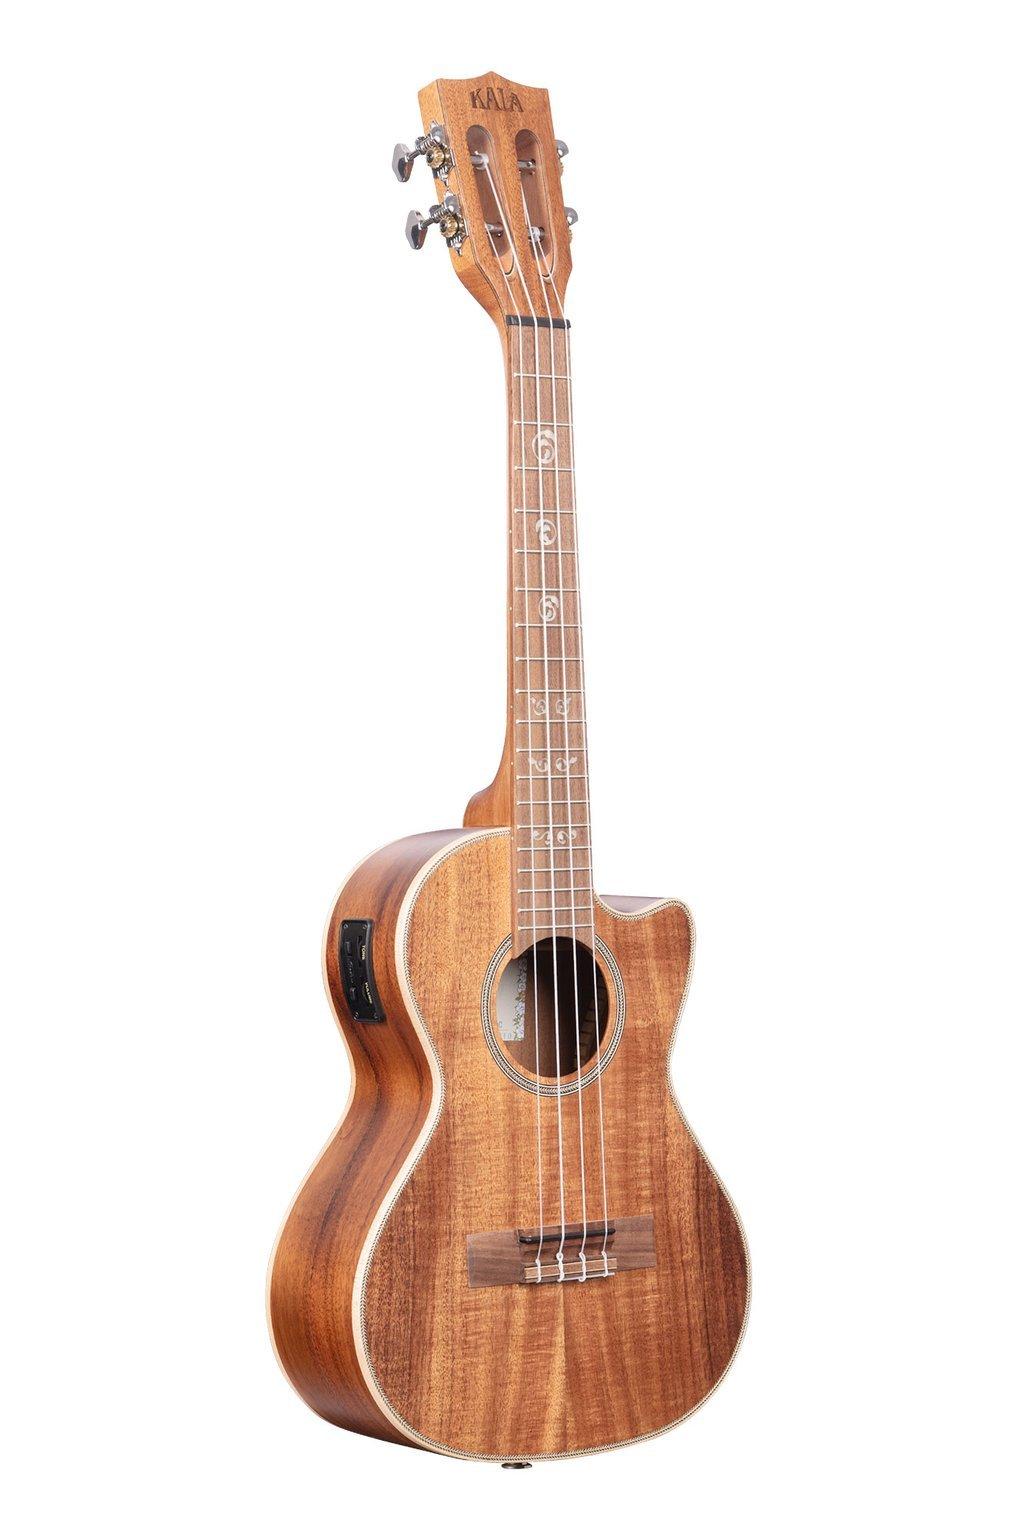 Kala SOLID ACACIA Tenor W/EQ Pre-amp & Pickup